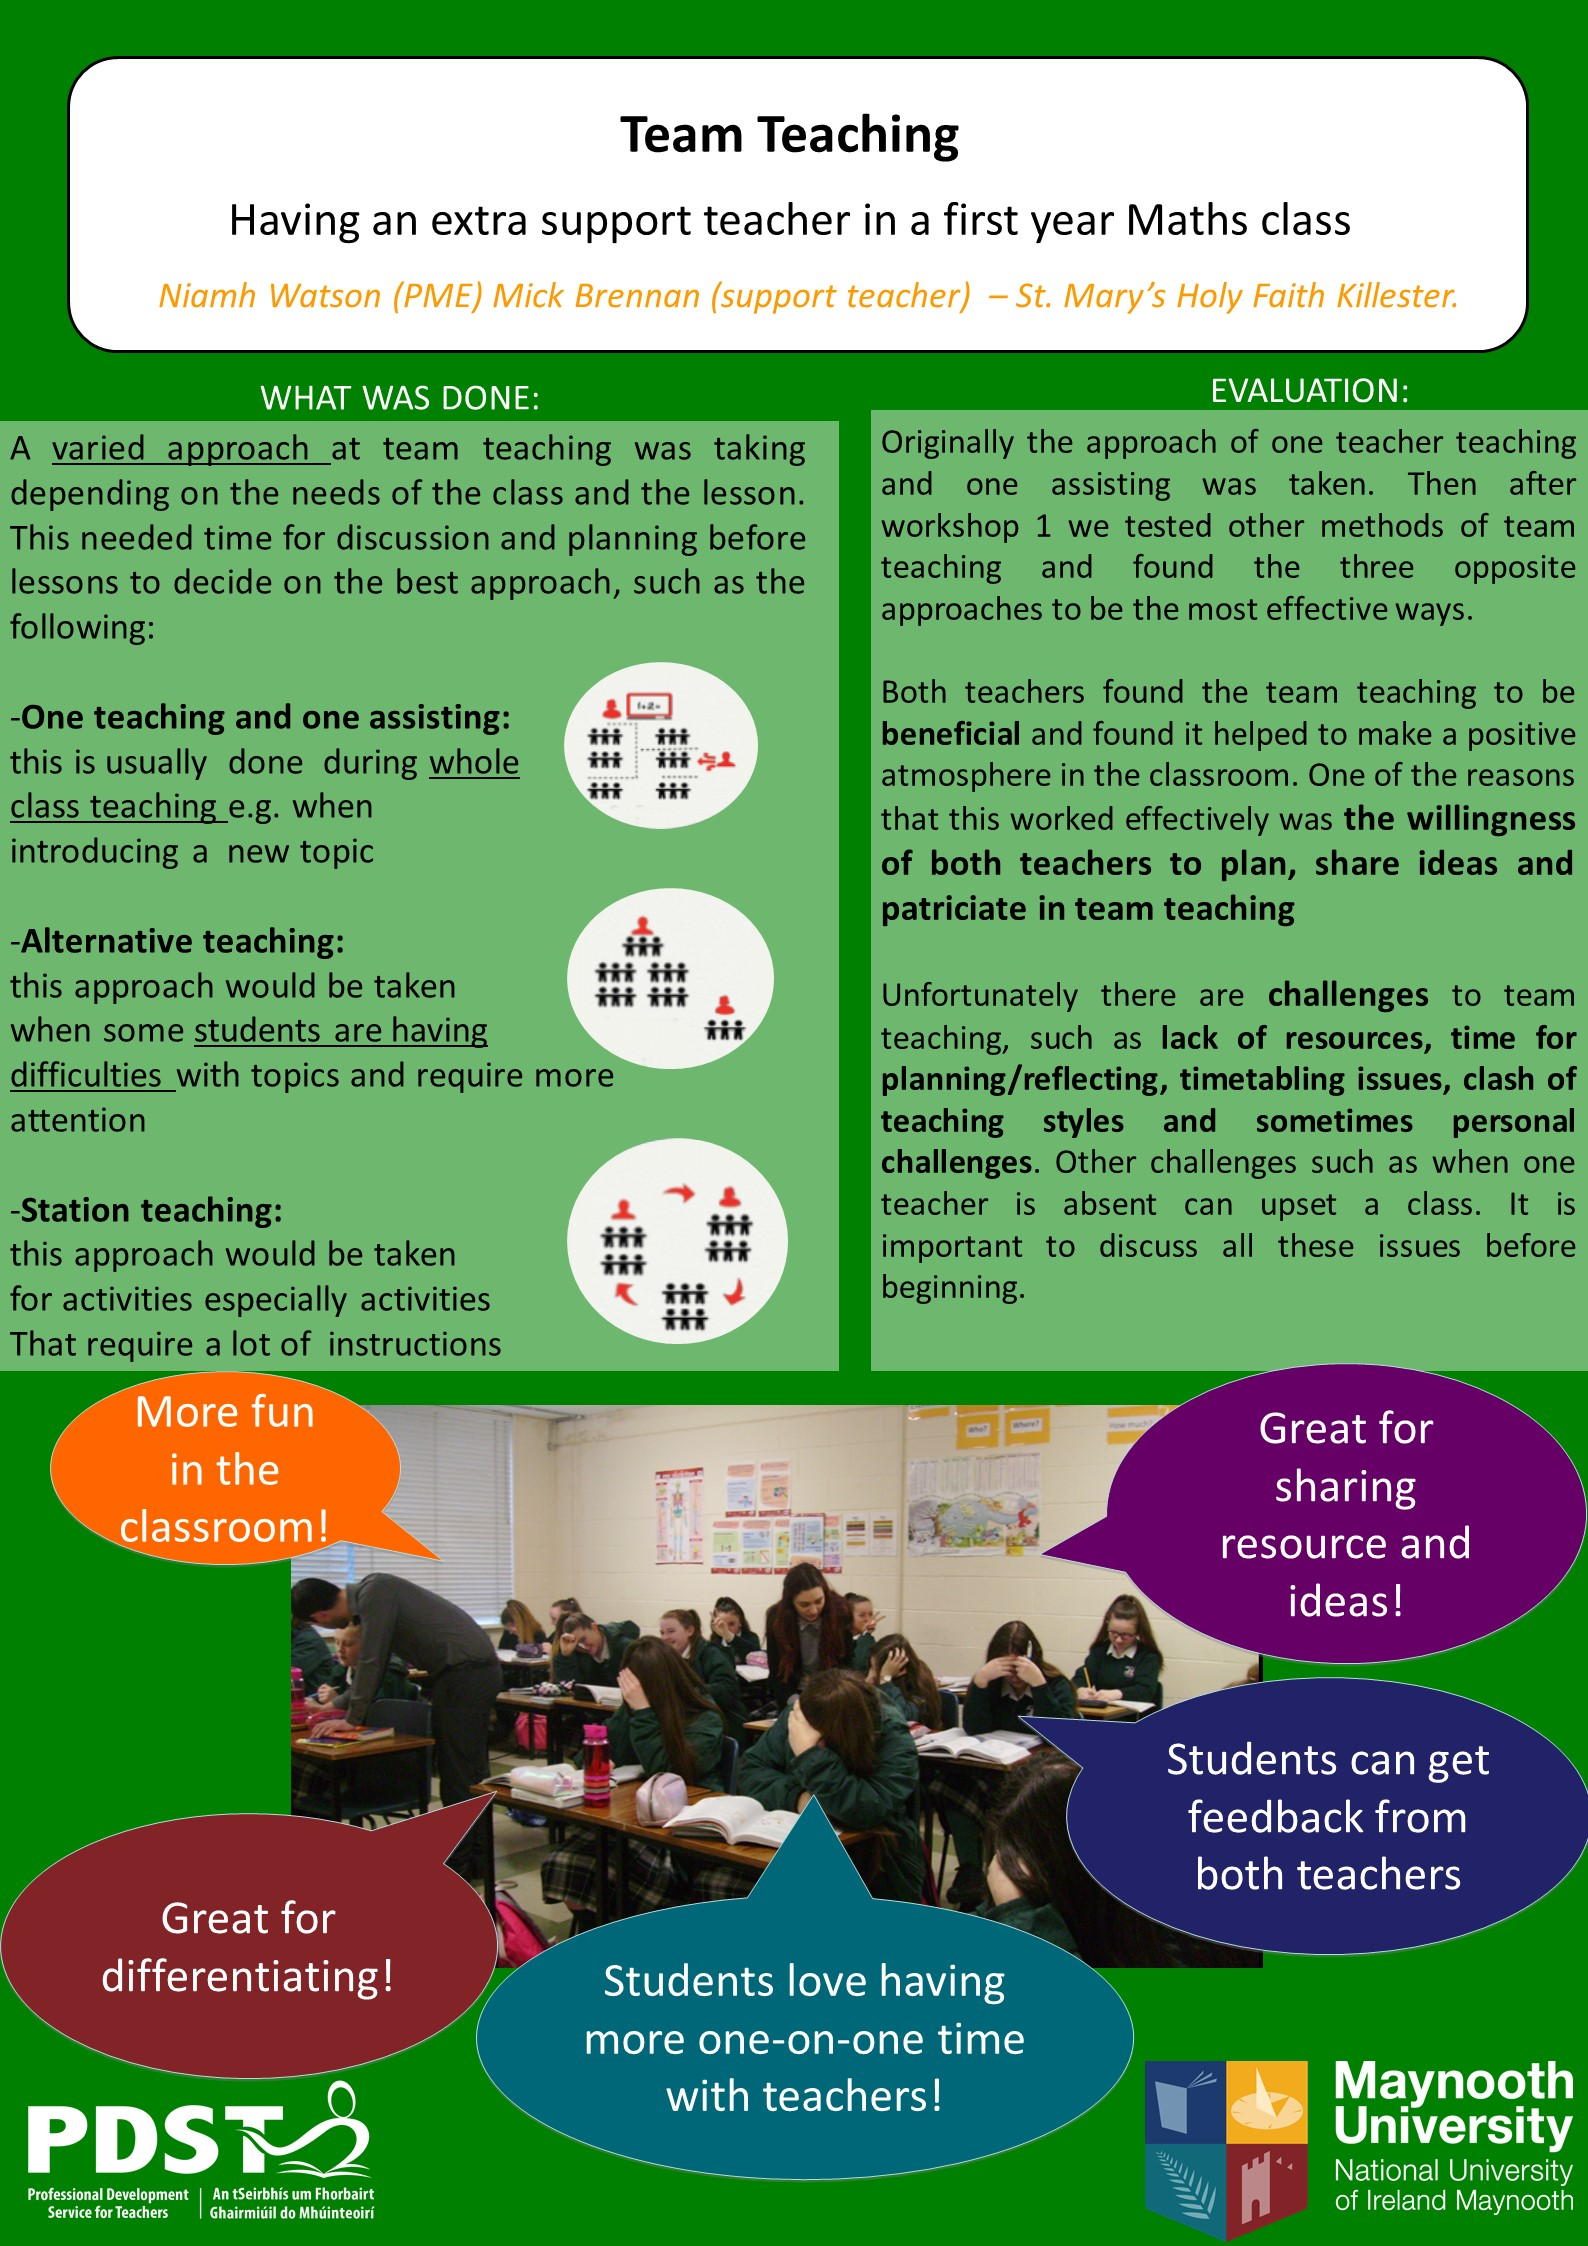 Team Teaching 2017 | PDST